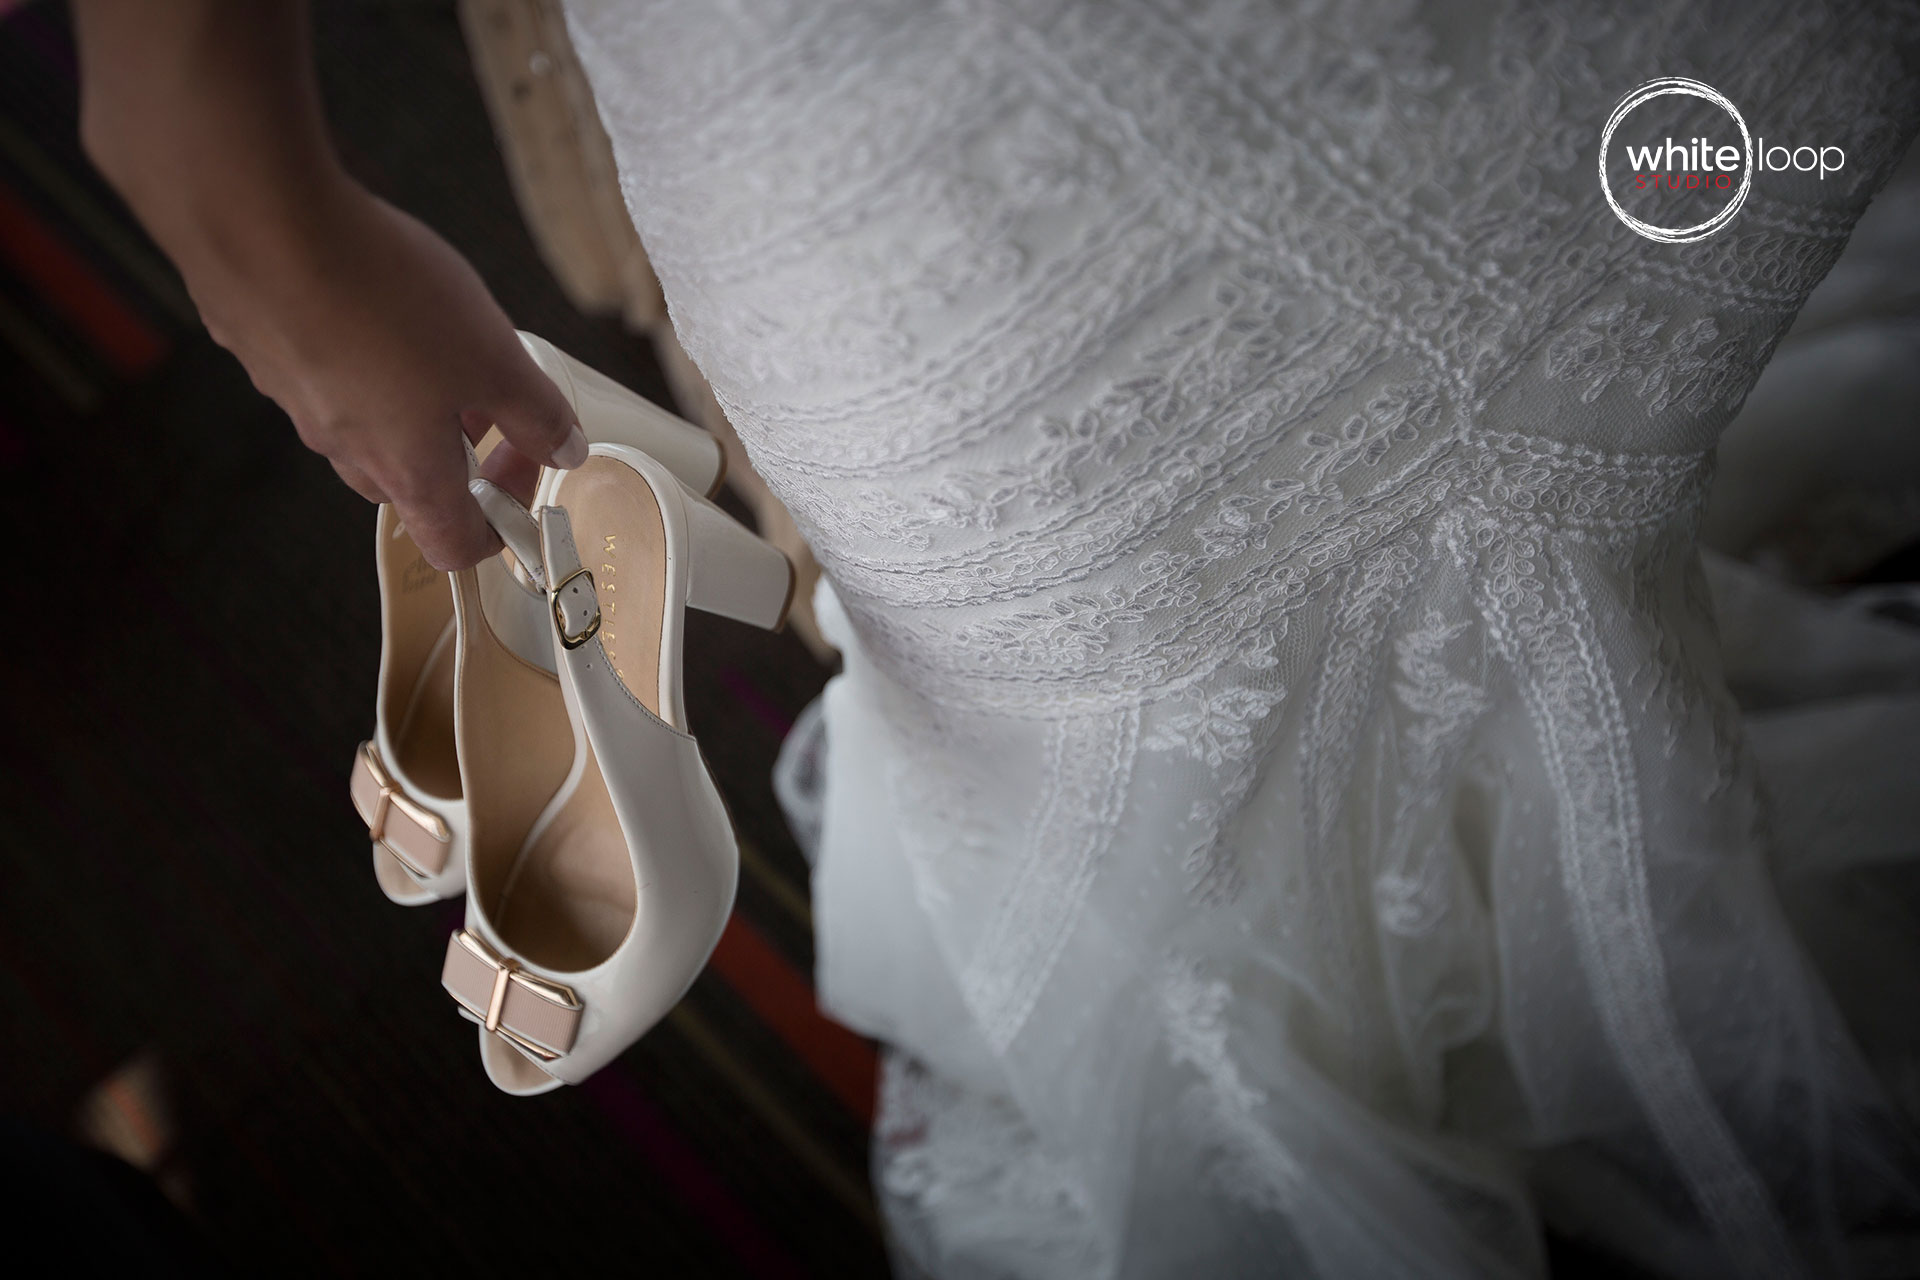 The bride holding her heels.